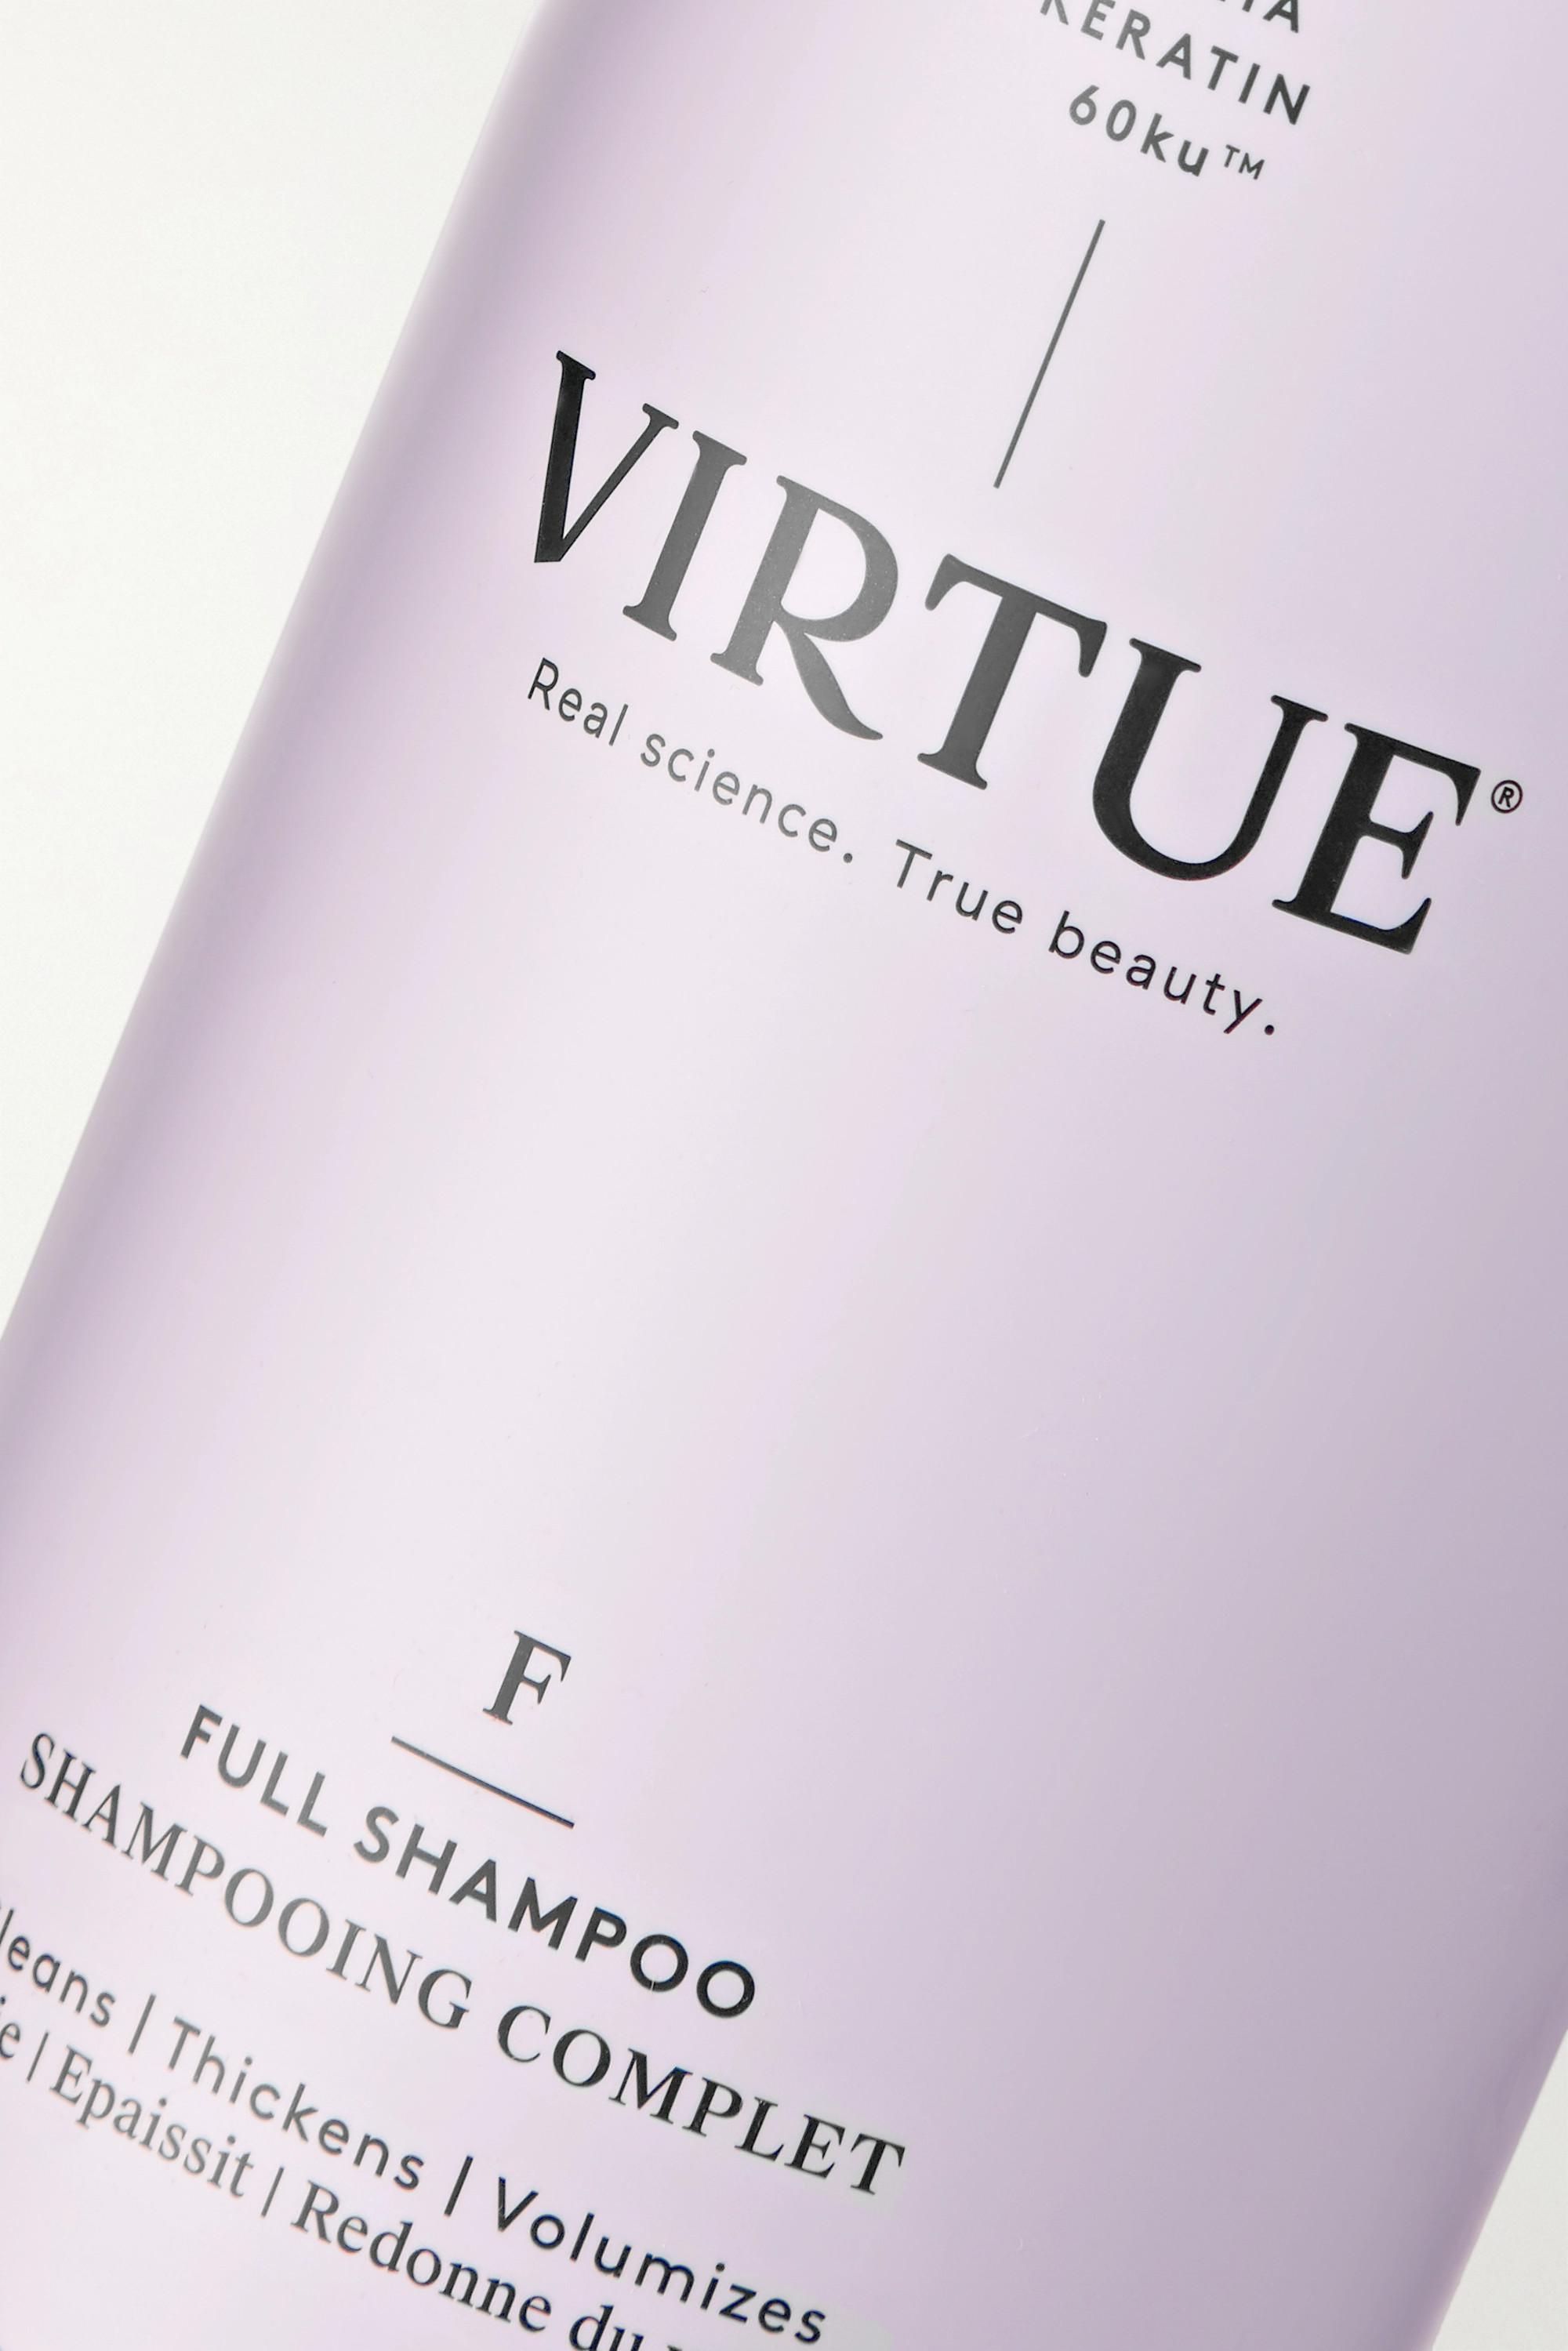 Virtue Full Shampoo, 500ml